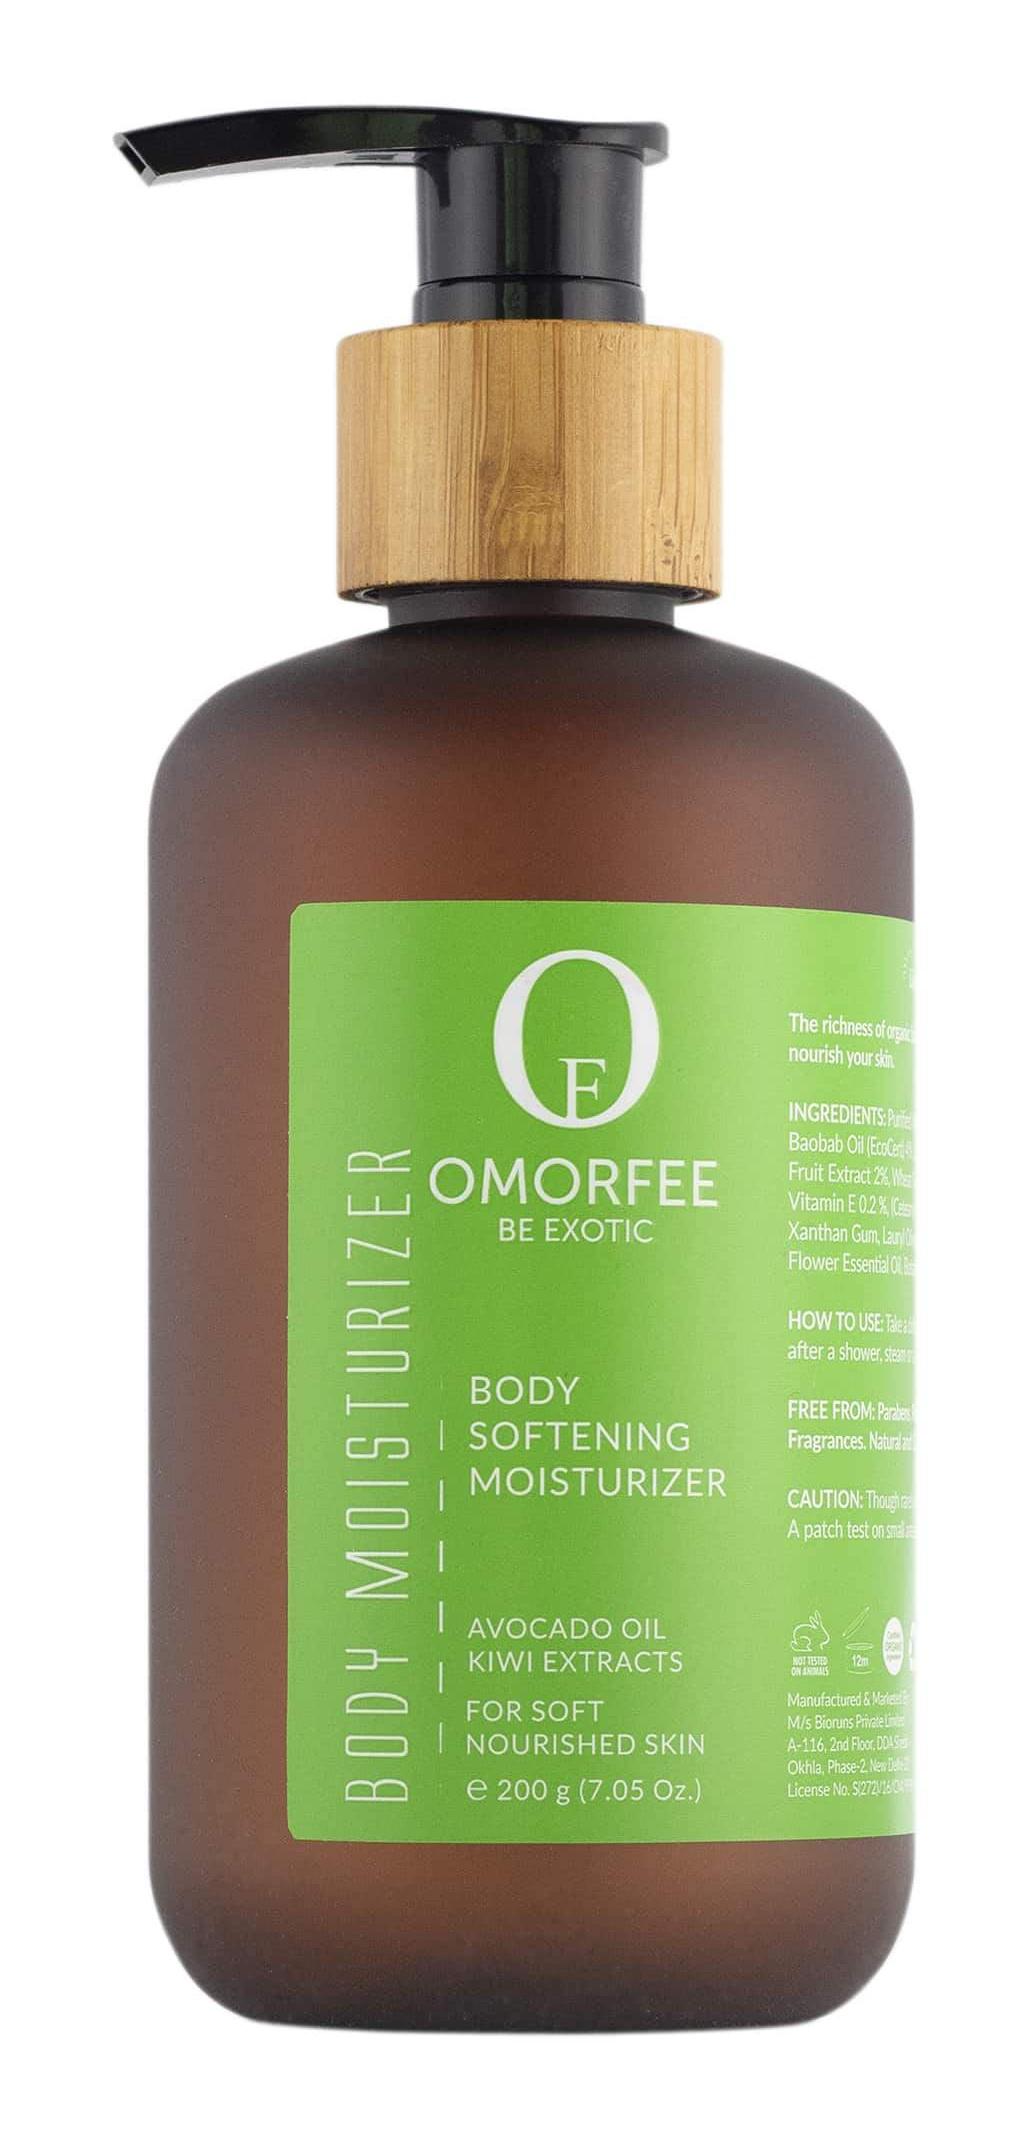 Omorfee Body Softening Moisturizer